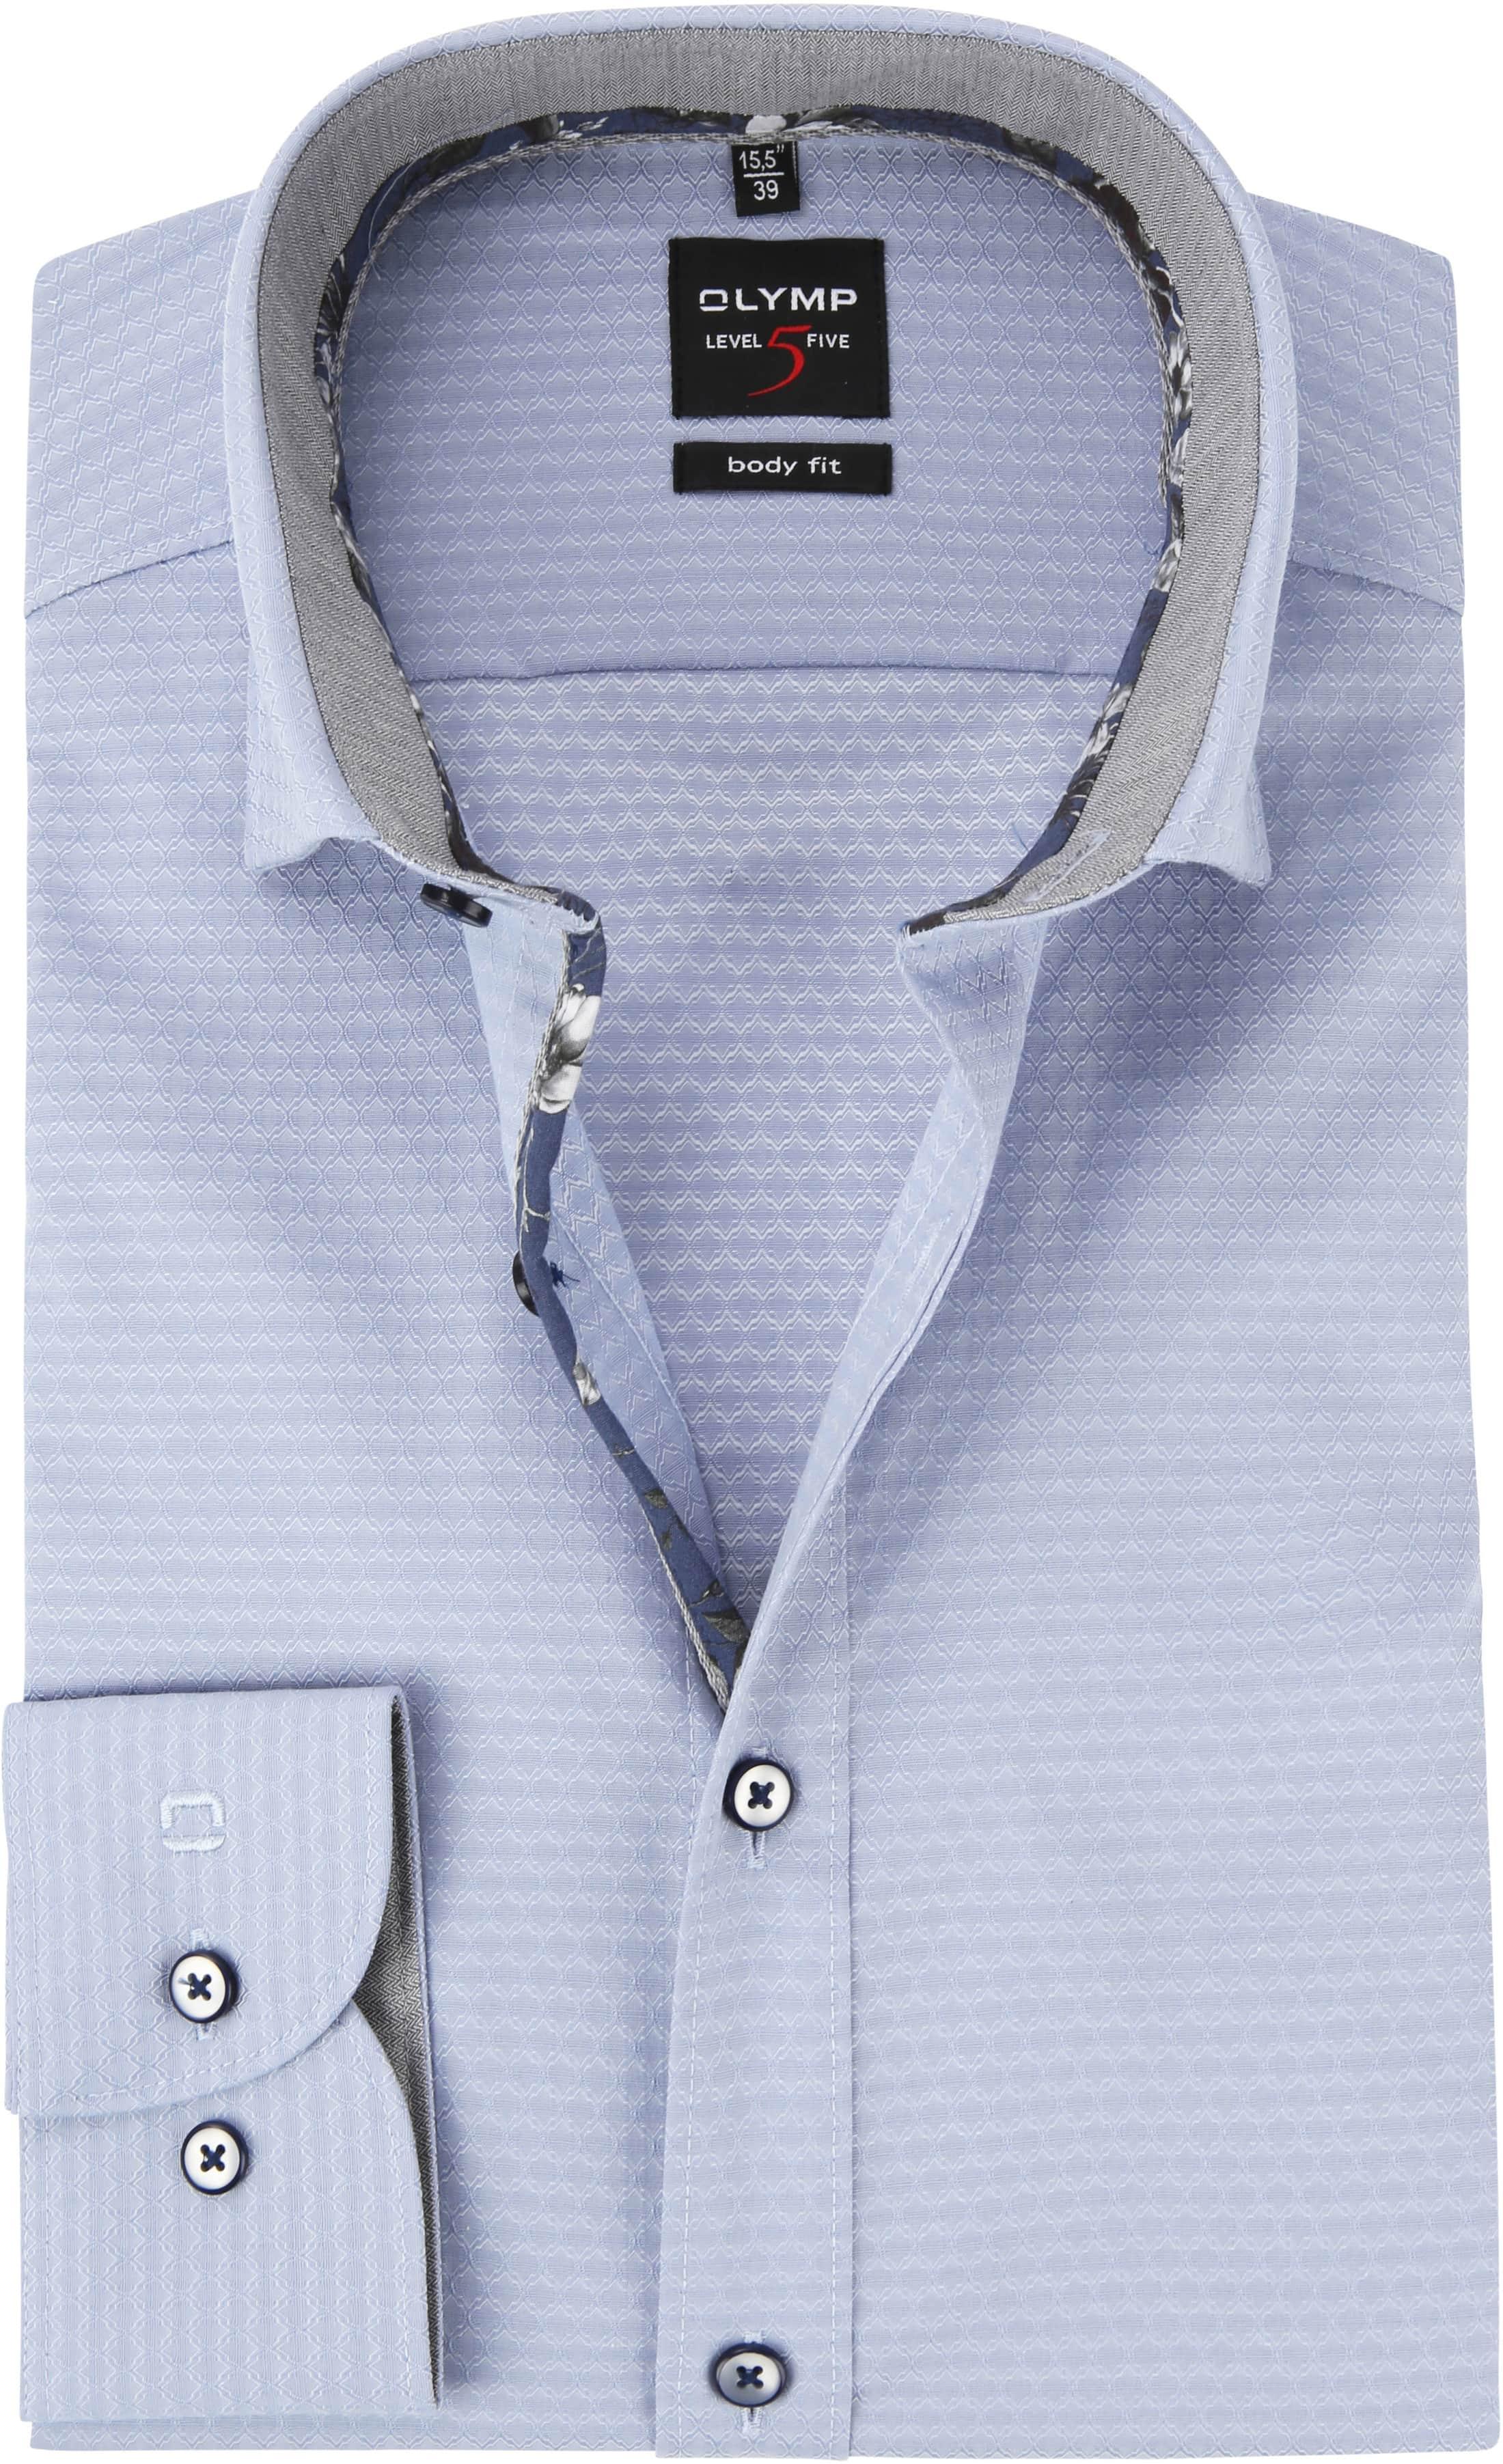 OLYMP Level 5 Overhemd Blauw Dessin foto 0